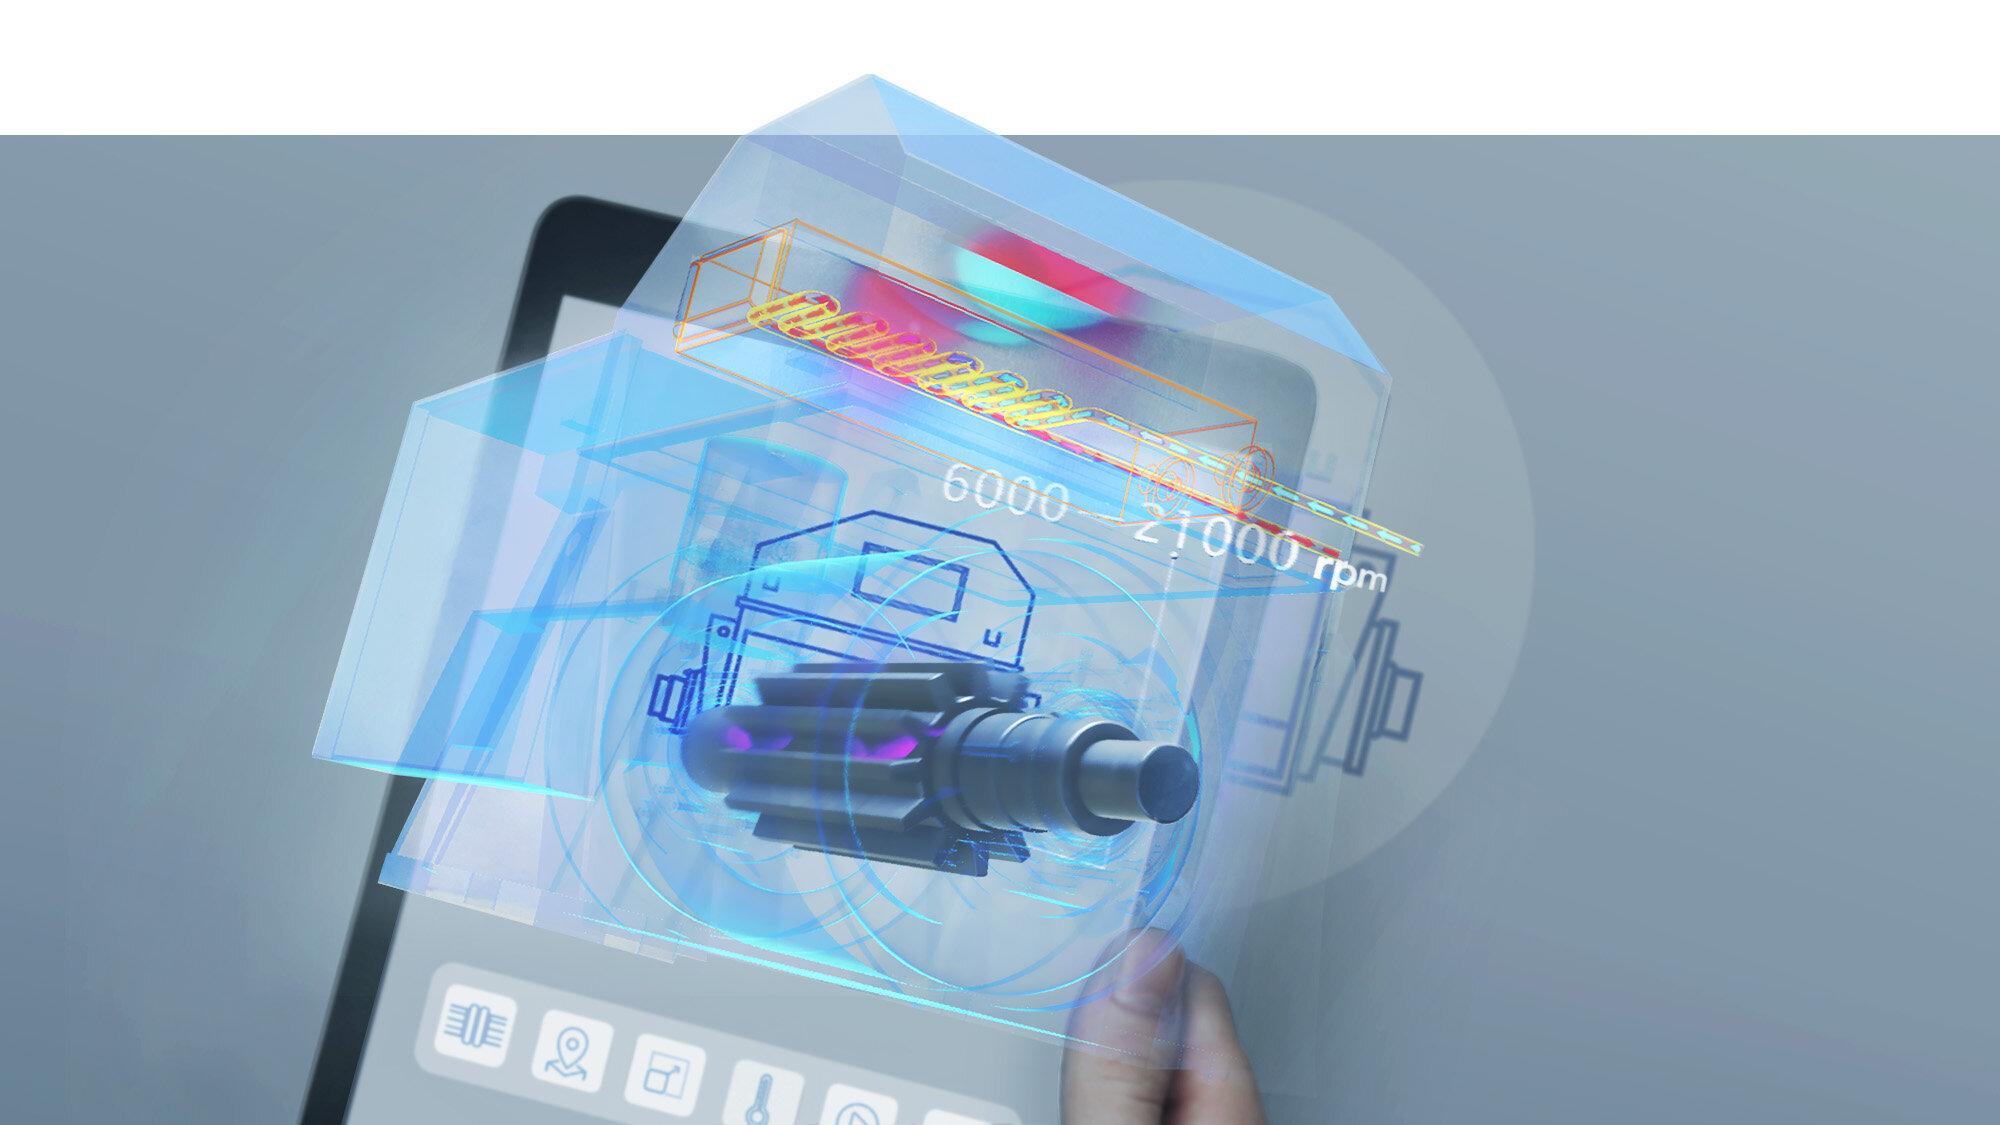 Yaskawa - Augmented Reality (AR) application